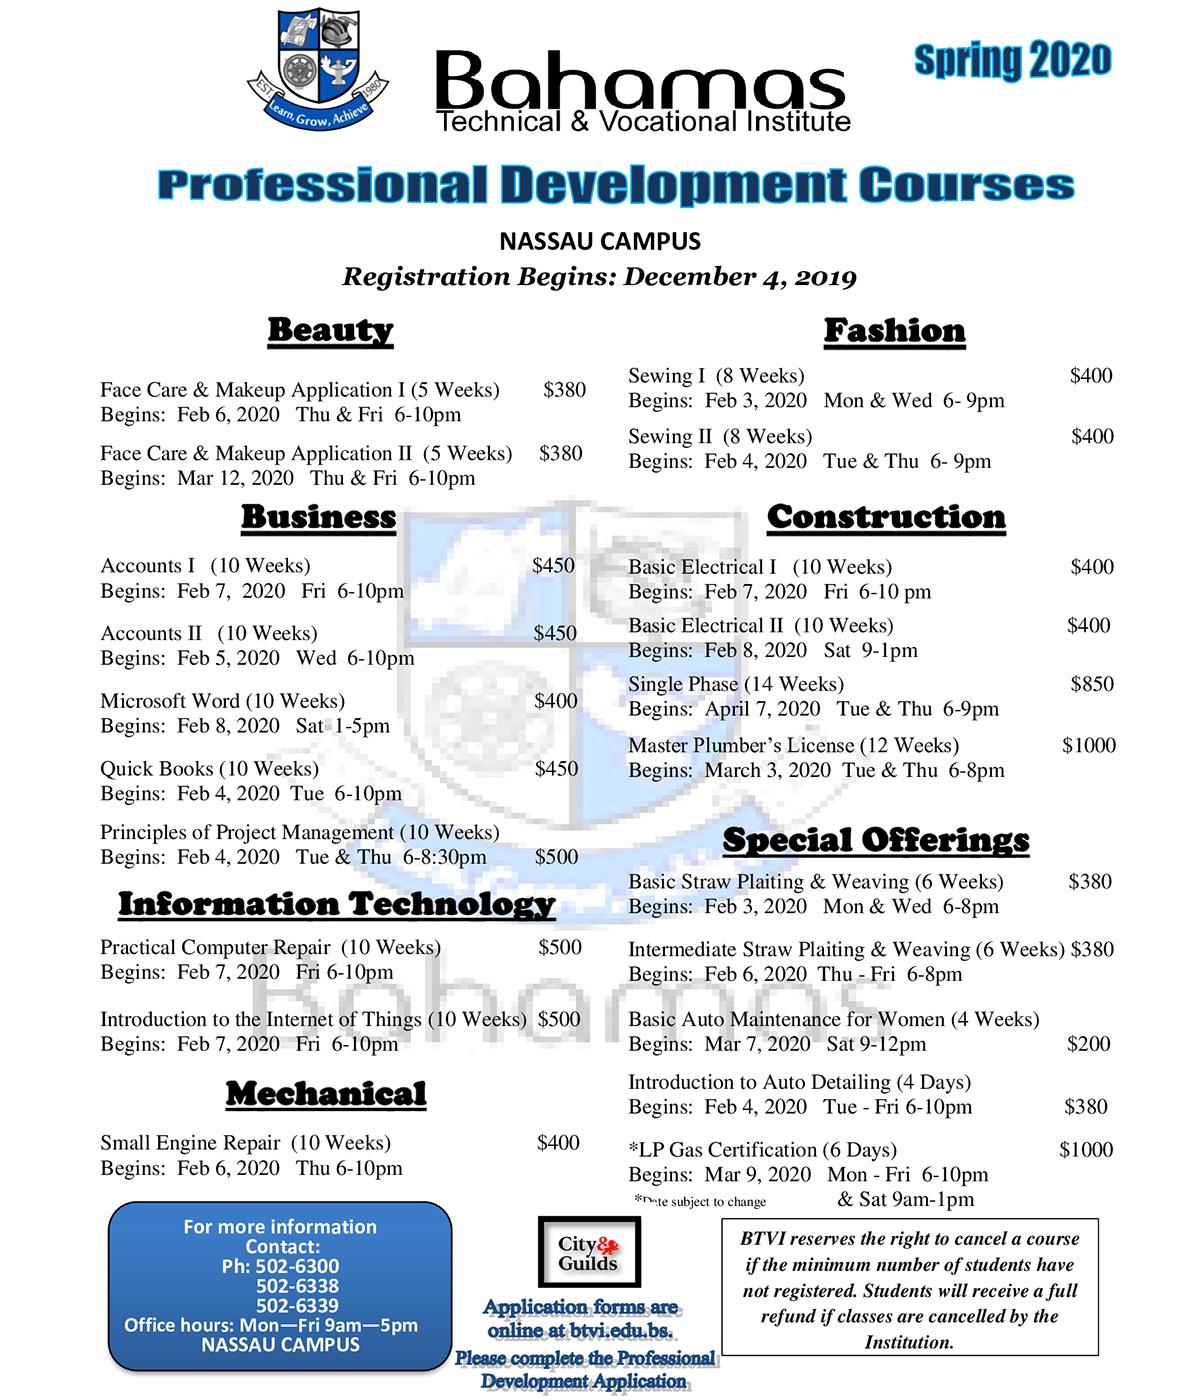 Bahamas Technical & Vocational Institute (BTVI) - Professional Development Services